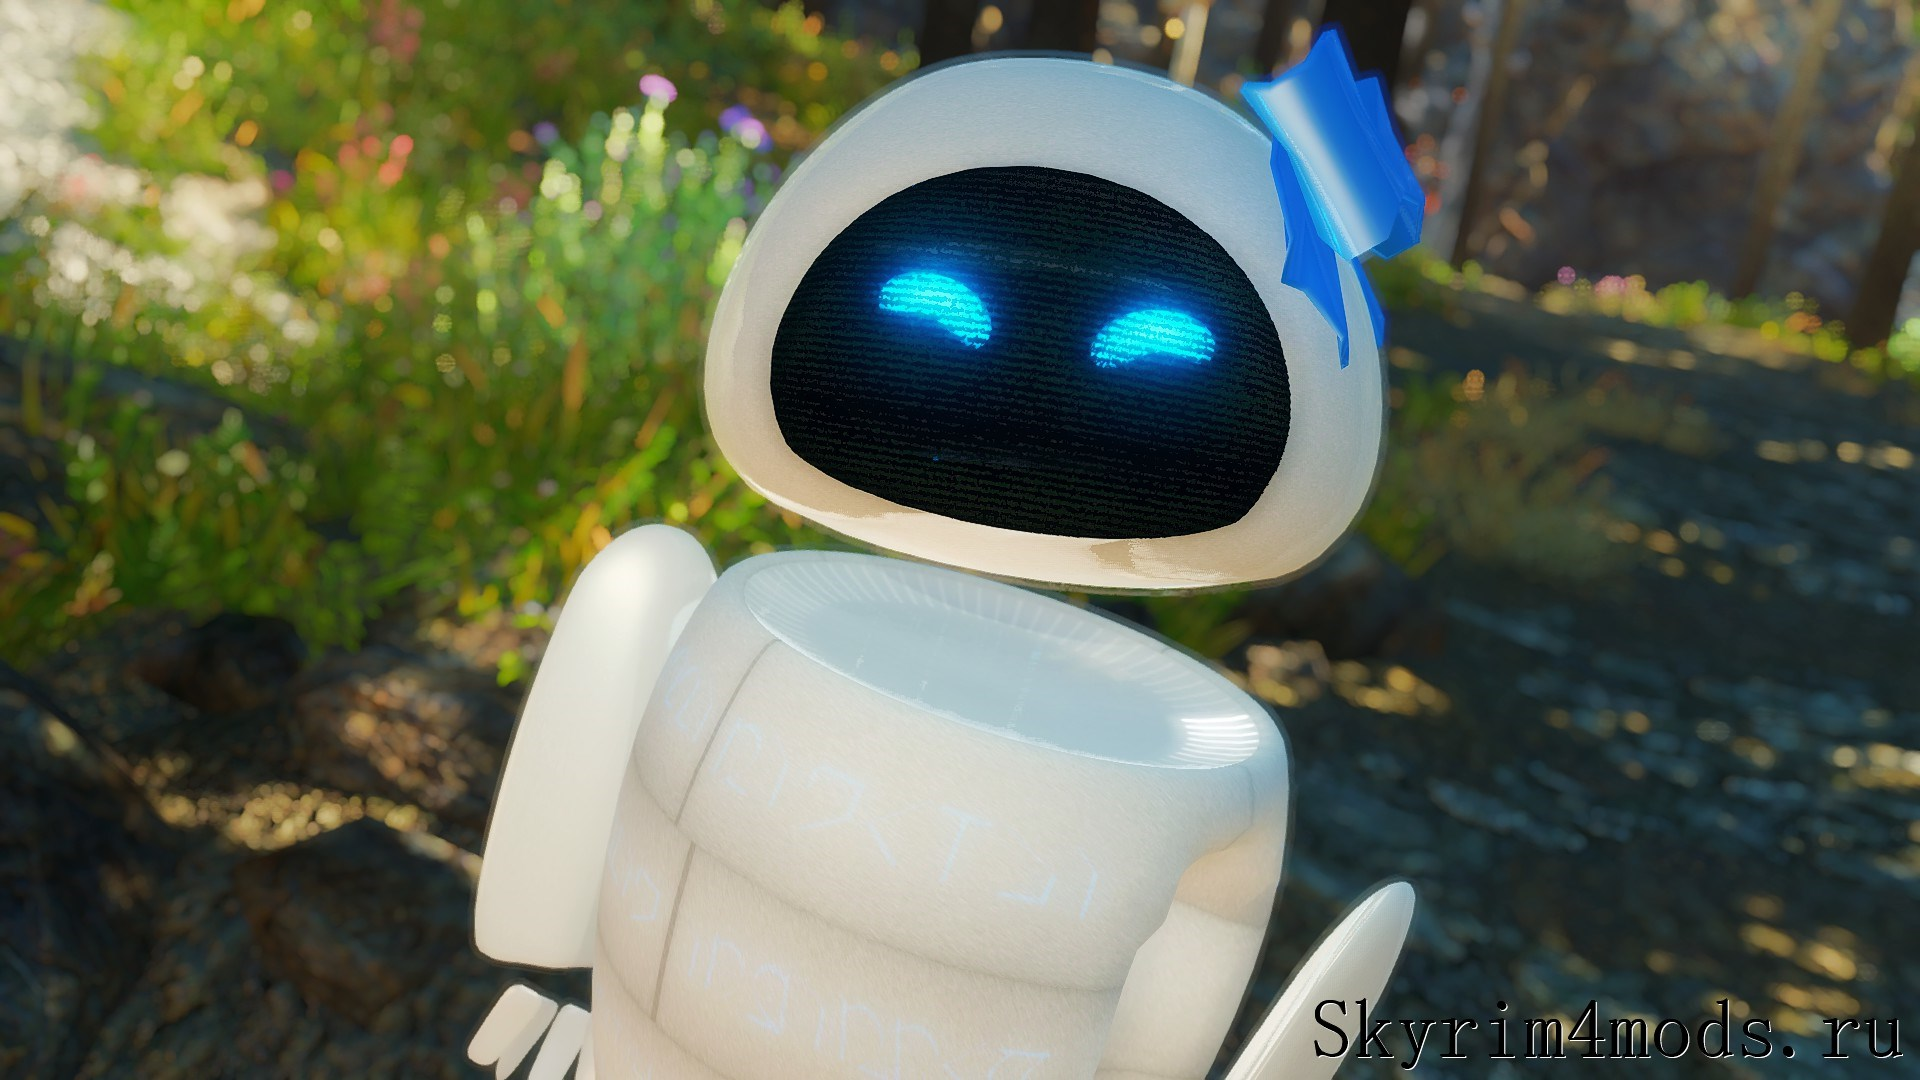 Комапаньон робот Мари